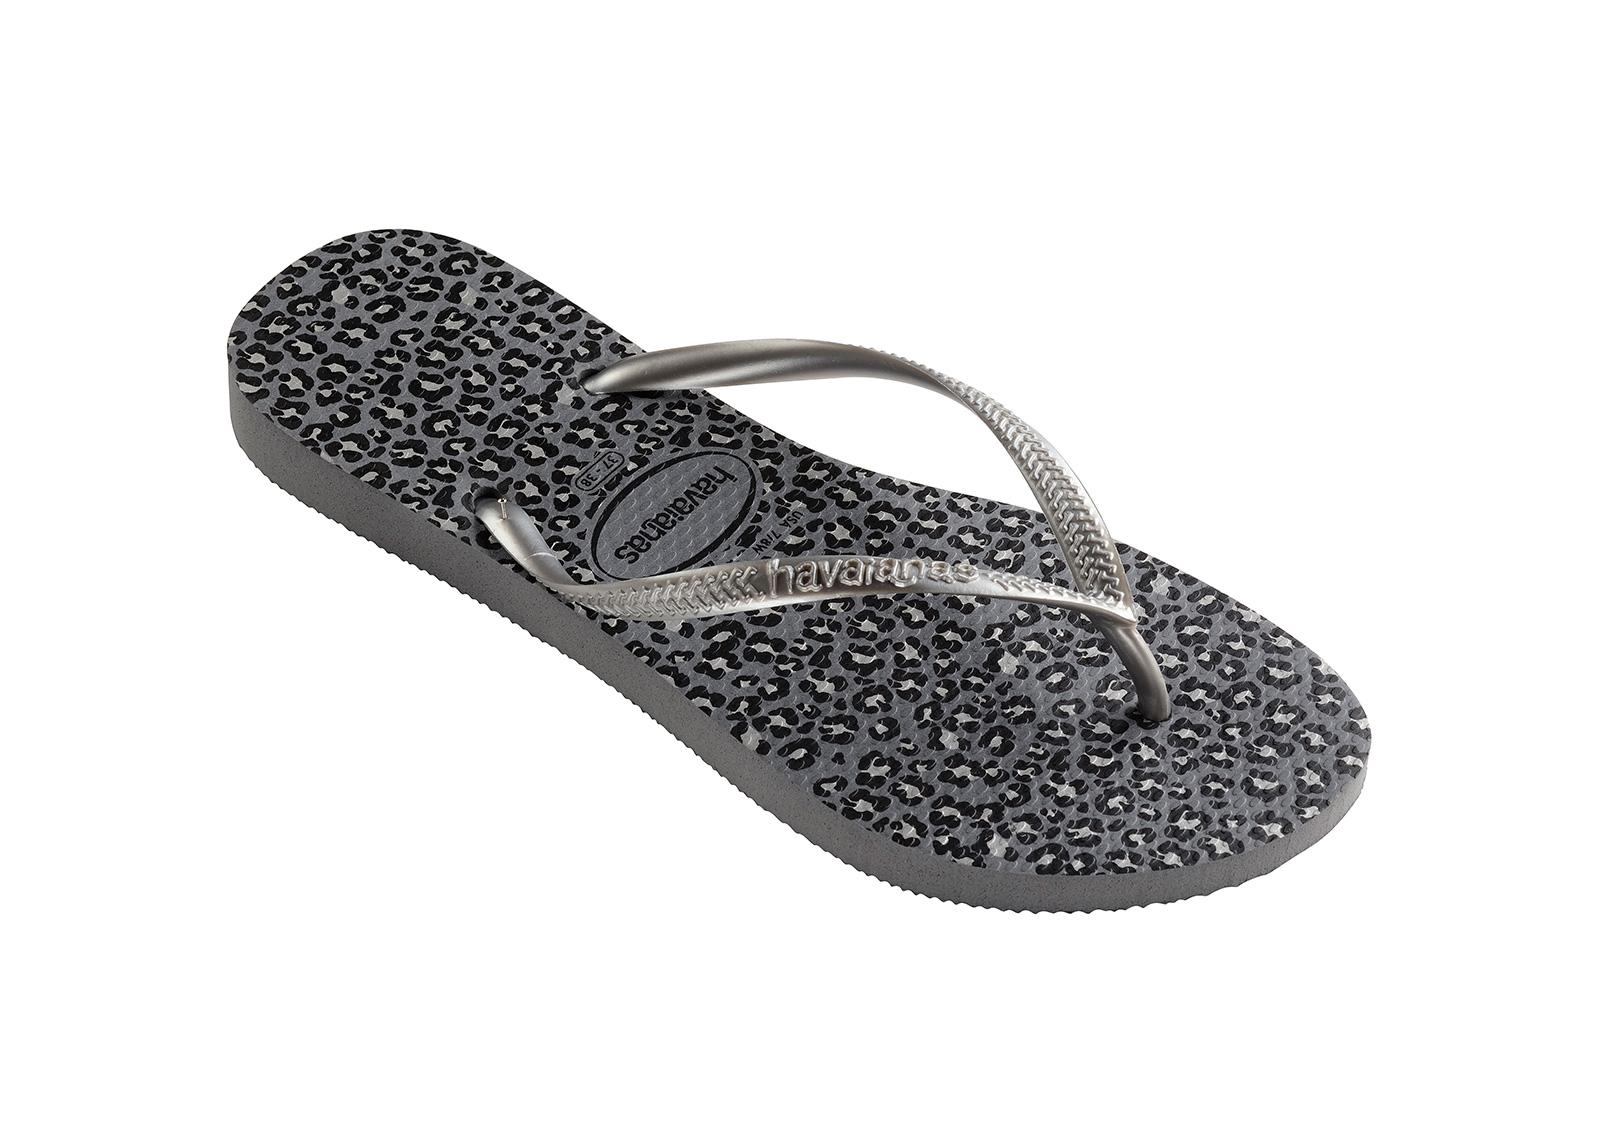 b4689ccf685bc Flip-Flops Flip-flops - Havaianas Slim Animals Steel Grey